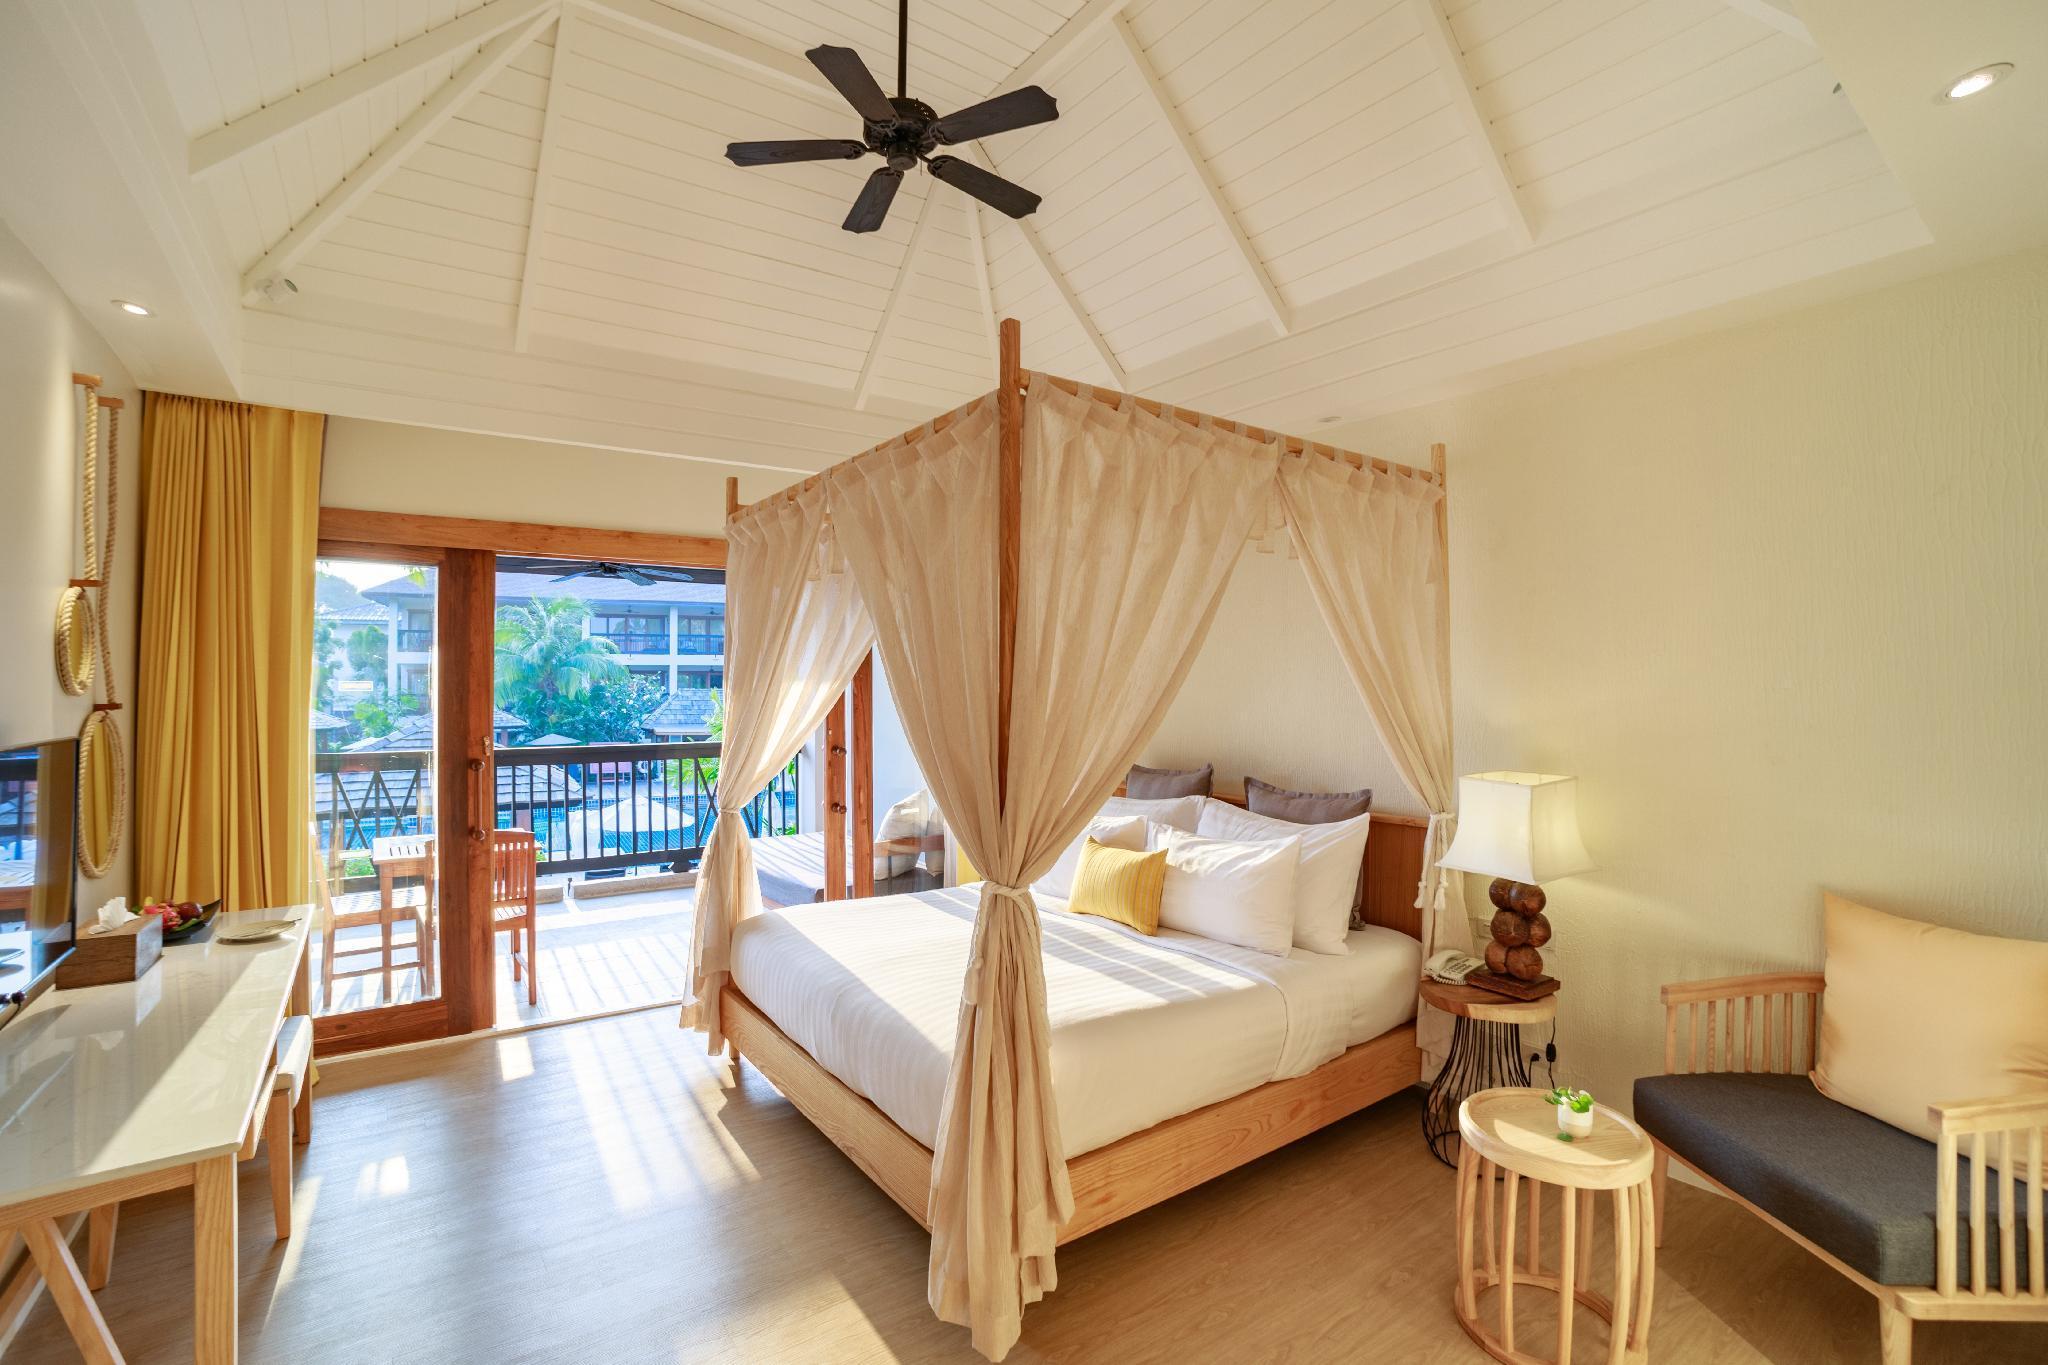 Bandara Resort & Spa in Koh Samui - Room Deals, Photos & Reviews